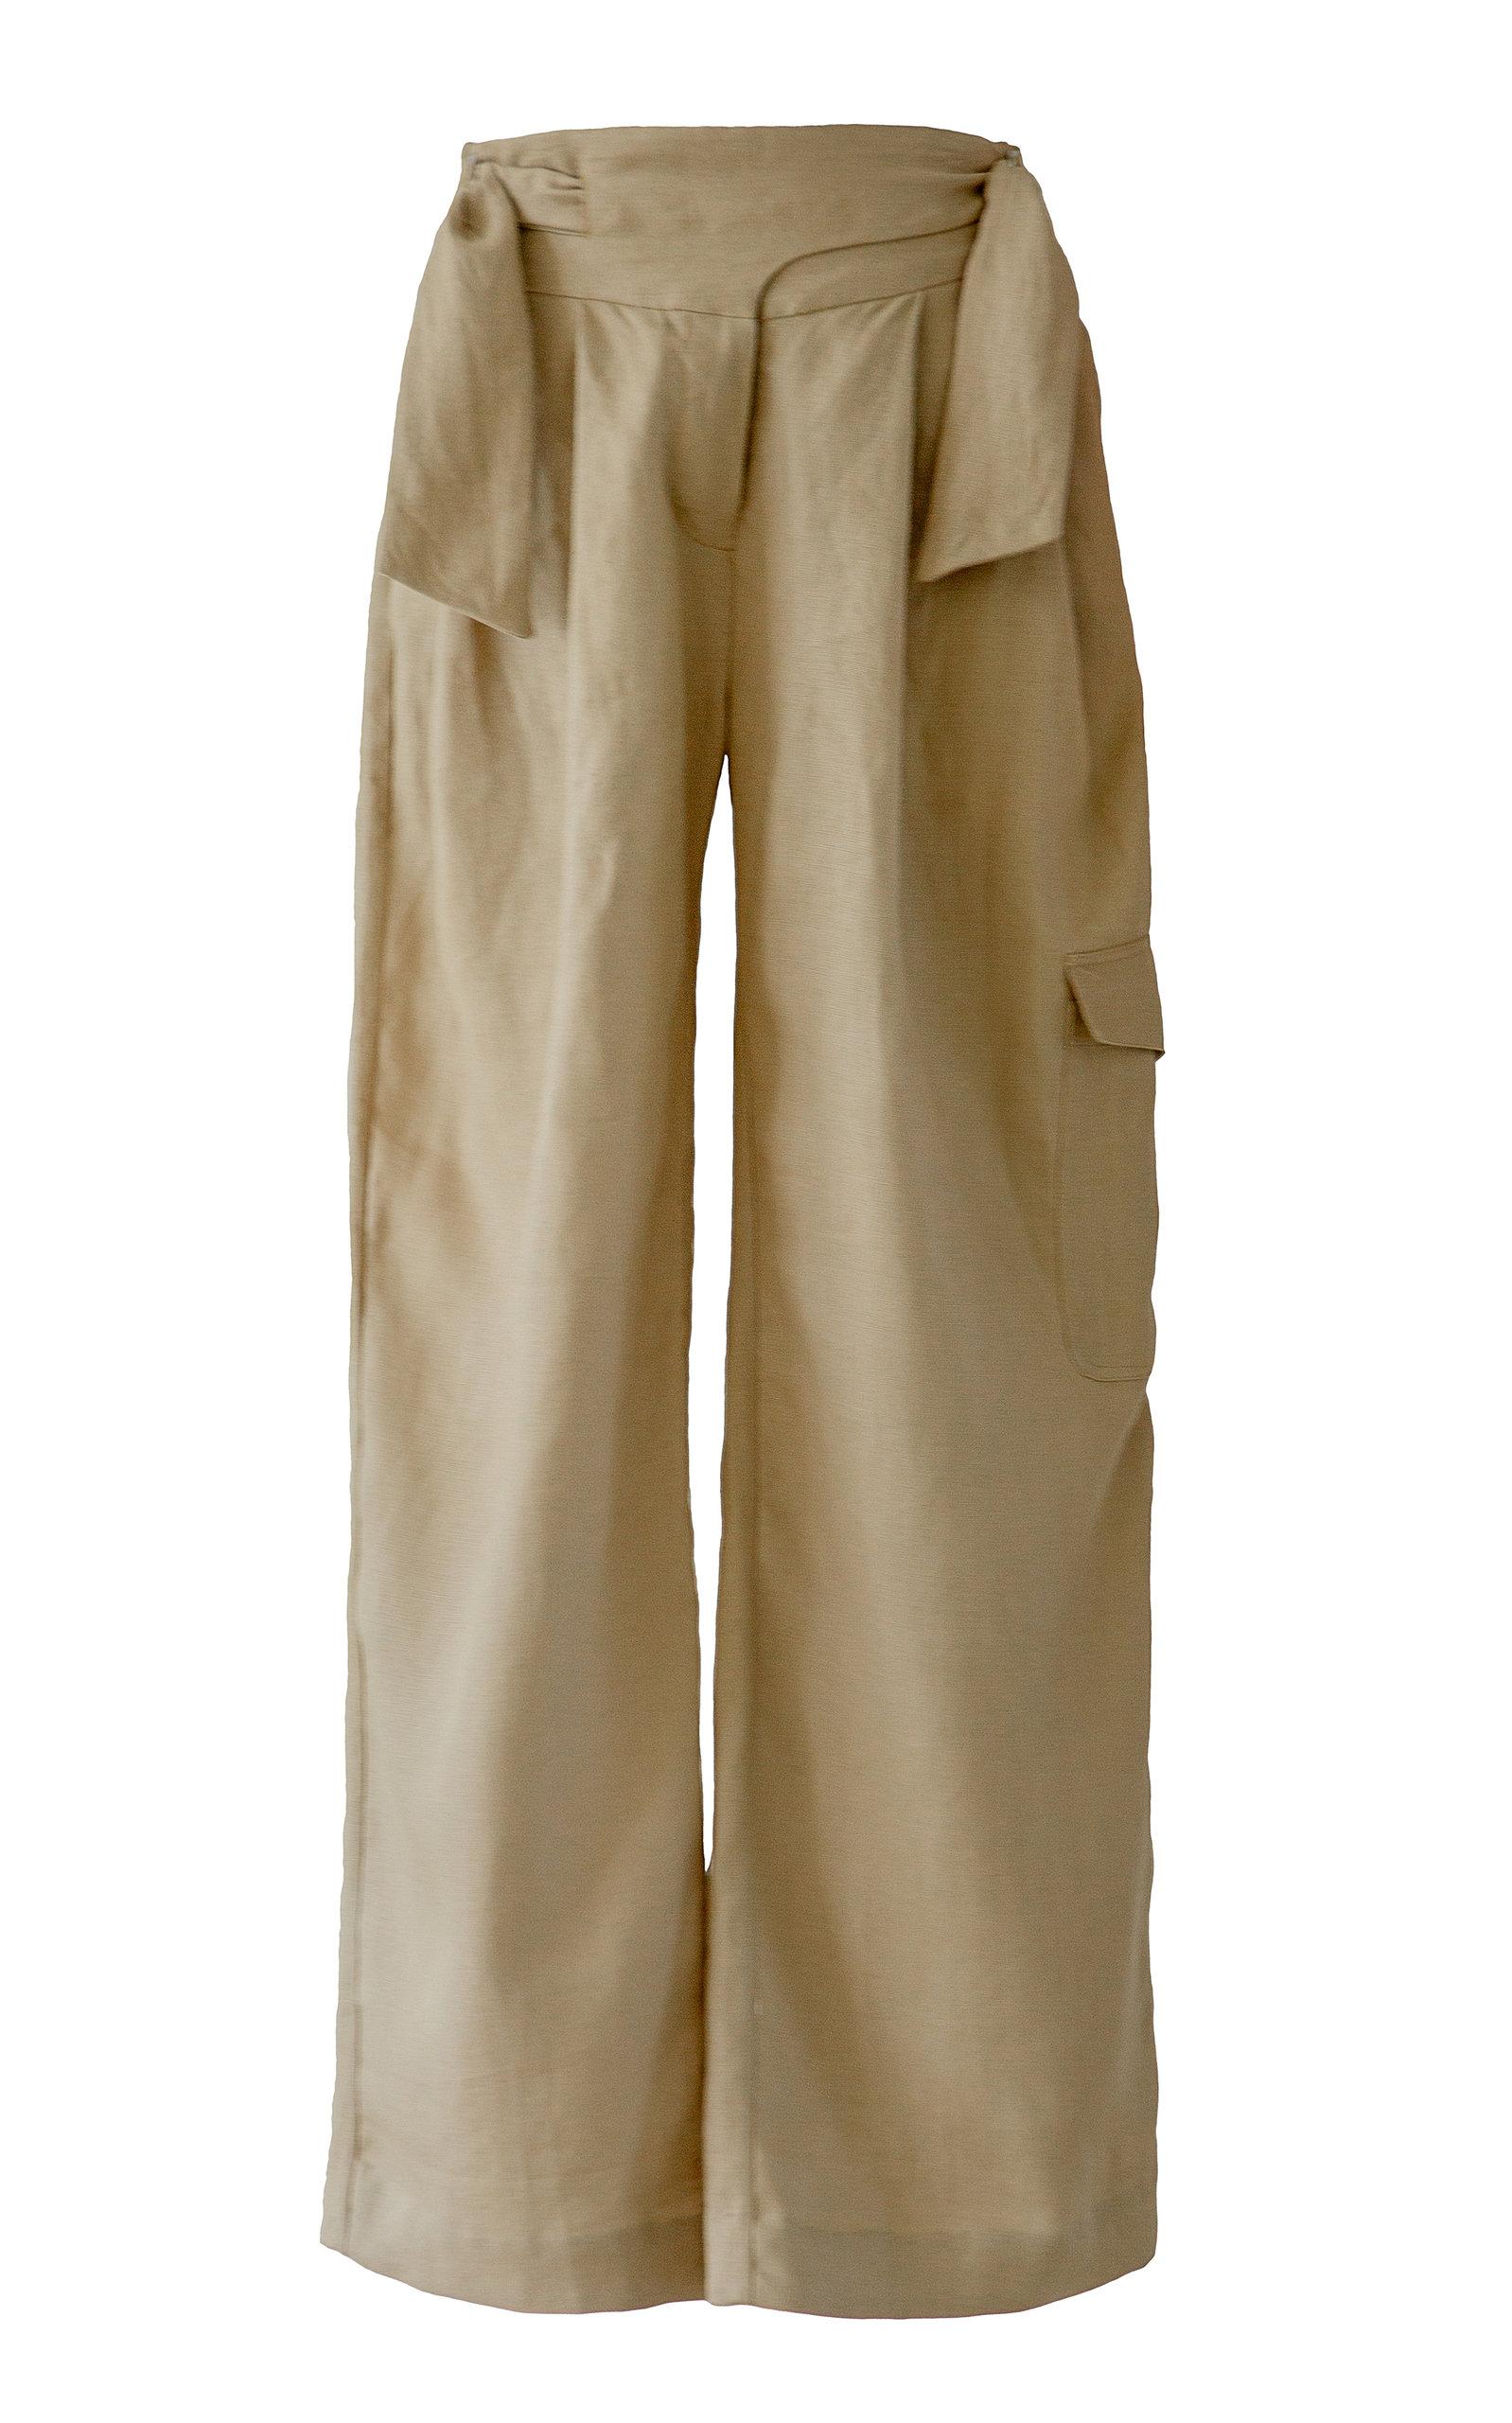 Women's Painter Linen Pants